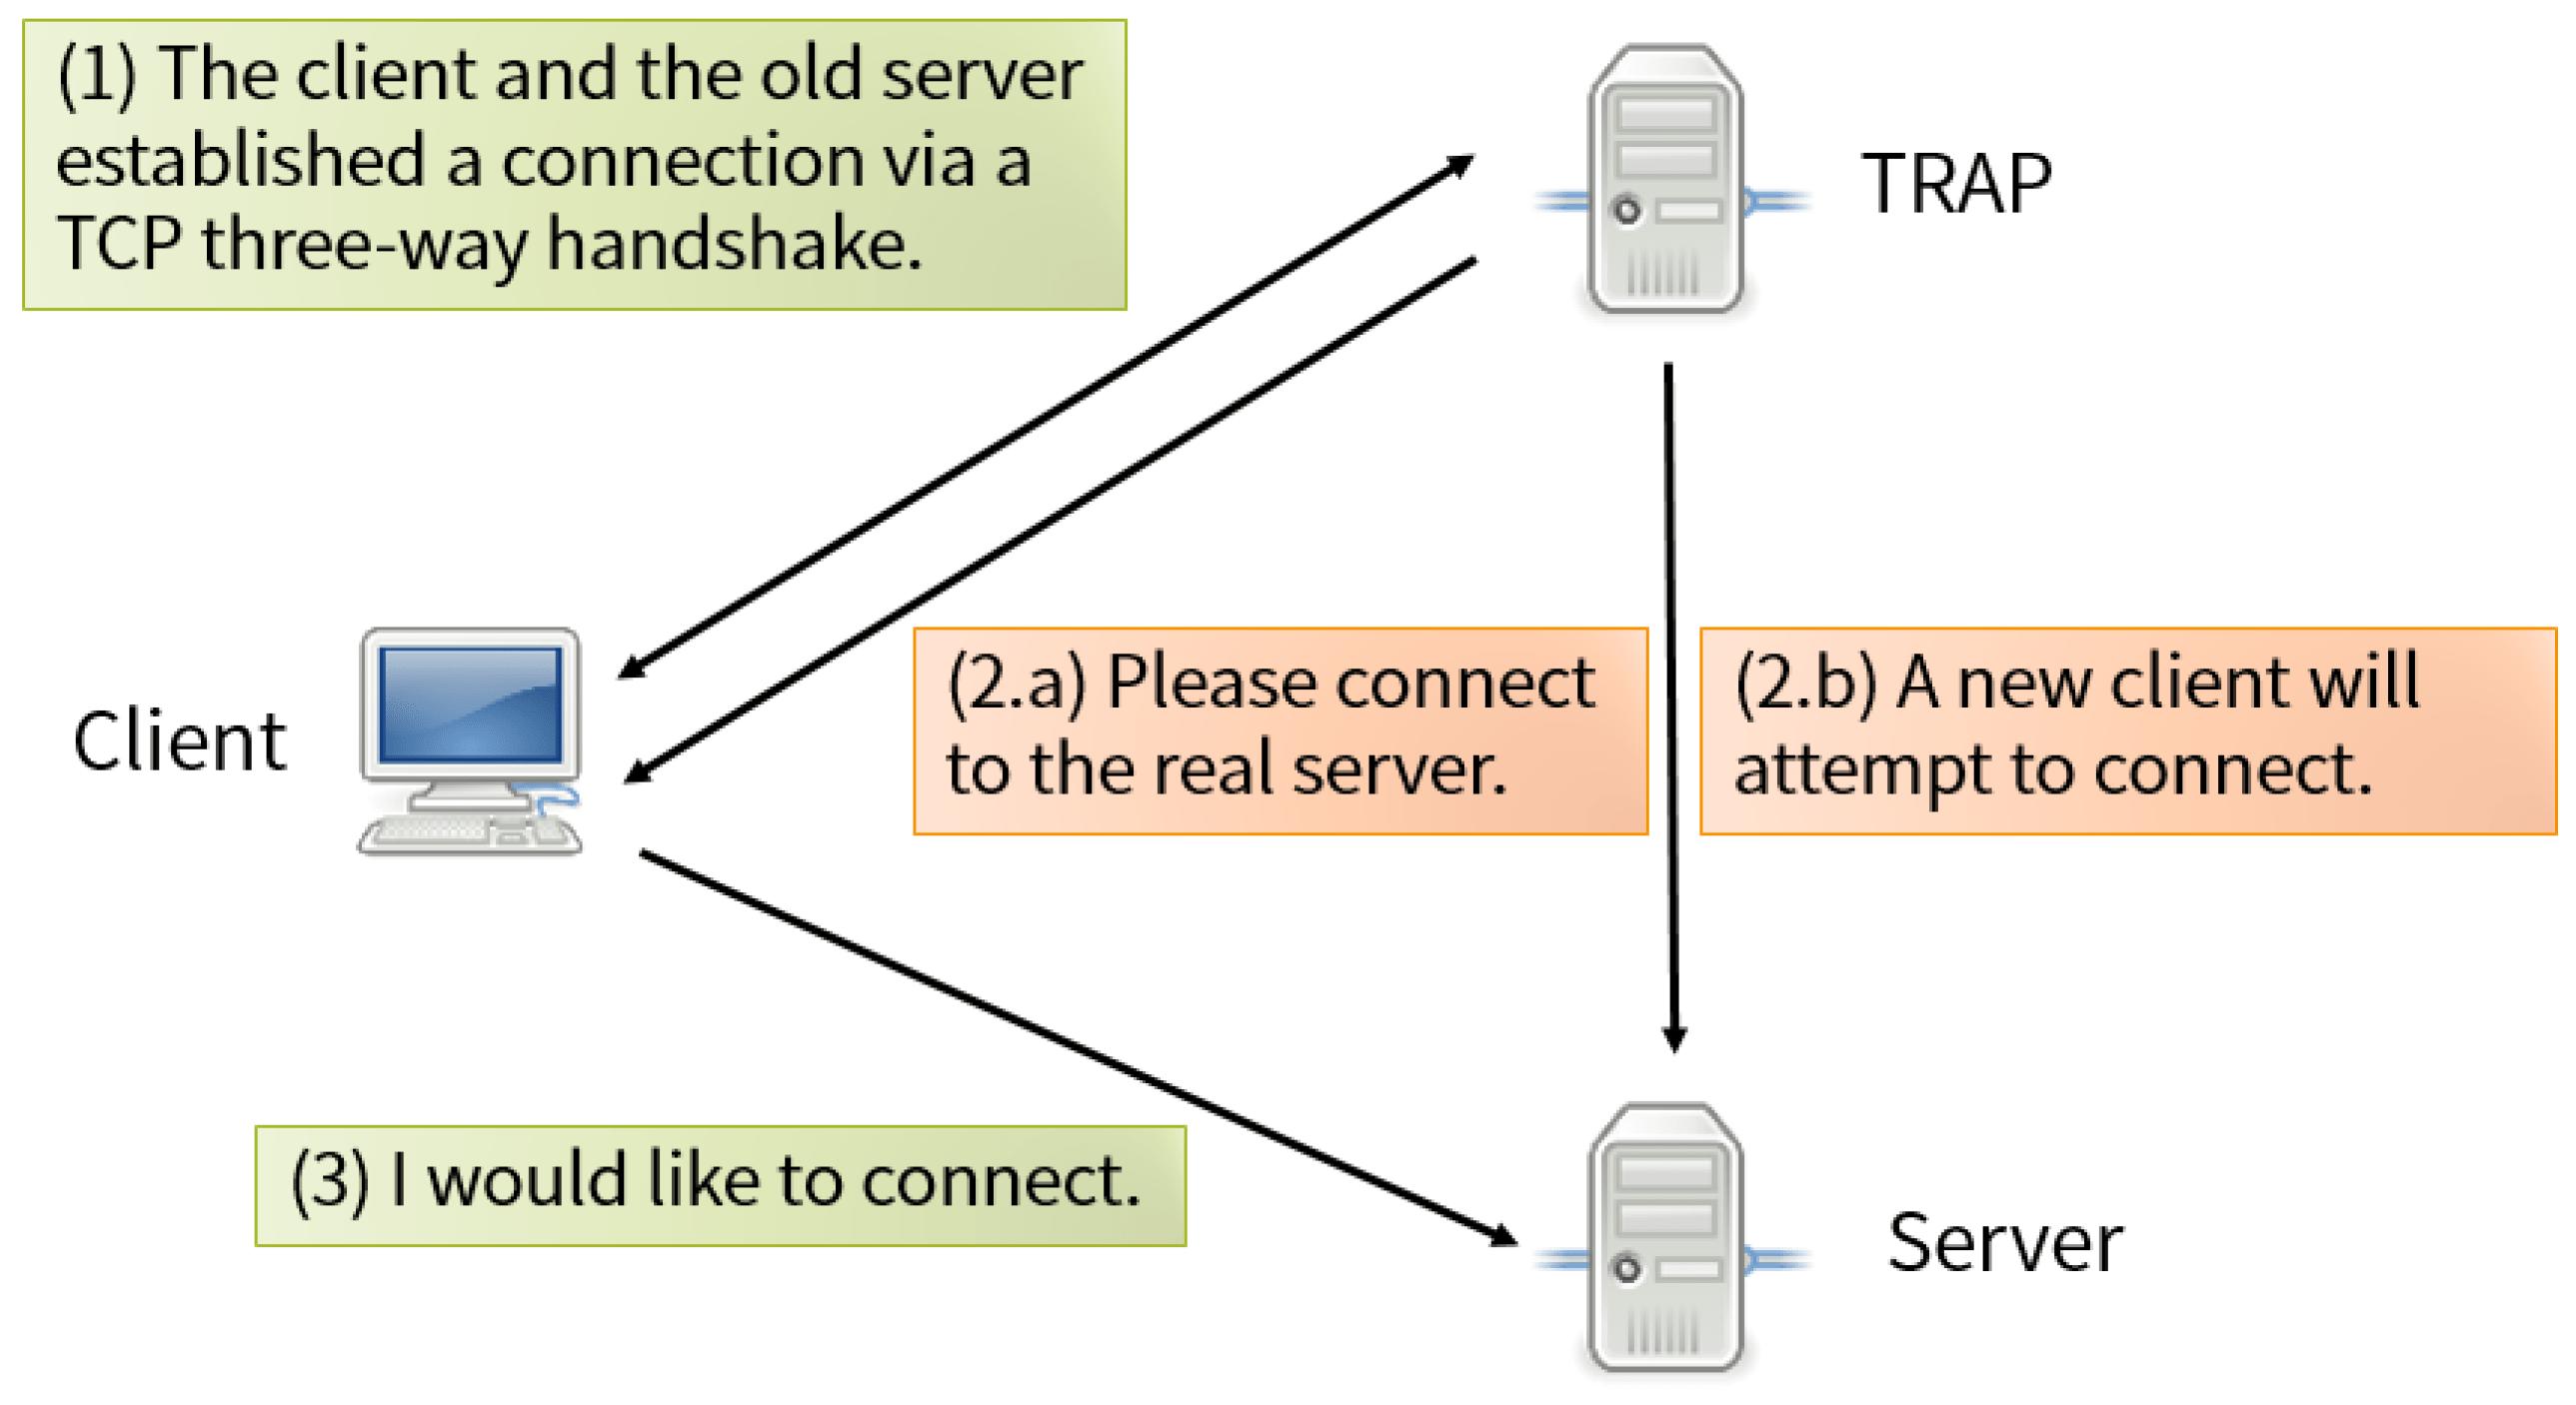 tcp three way handshake diagram 2006 cobalt headlight wiring applied sciences free full text trap a applsci 06 00358 g006